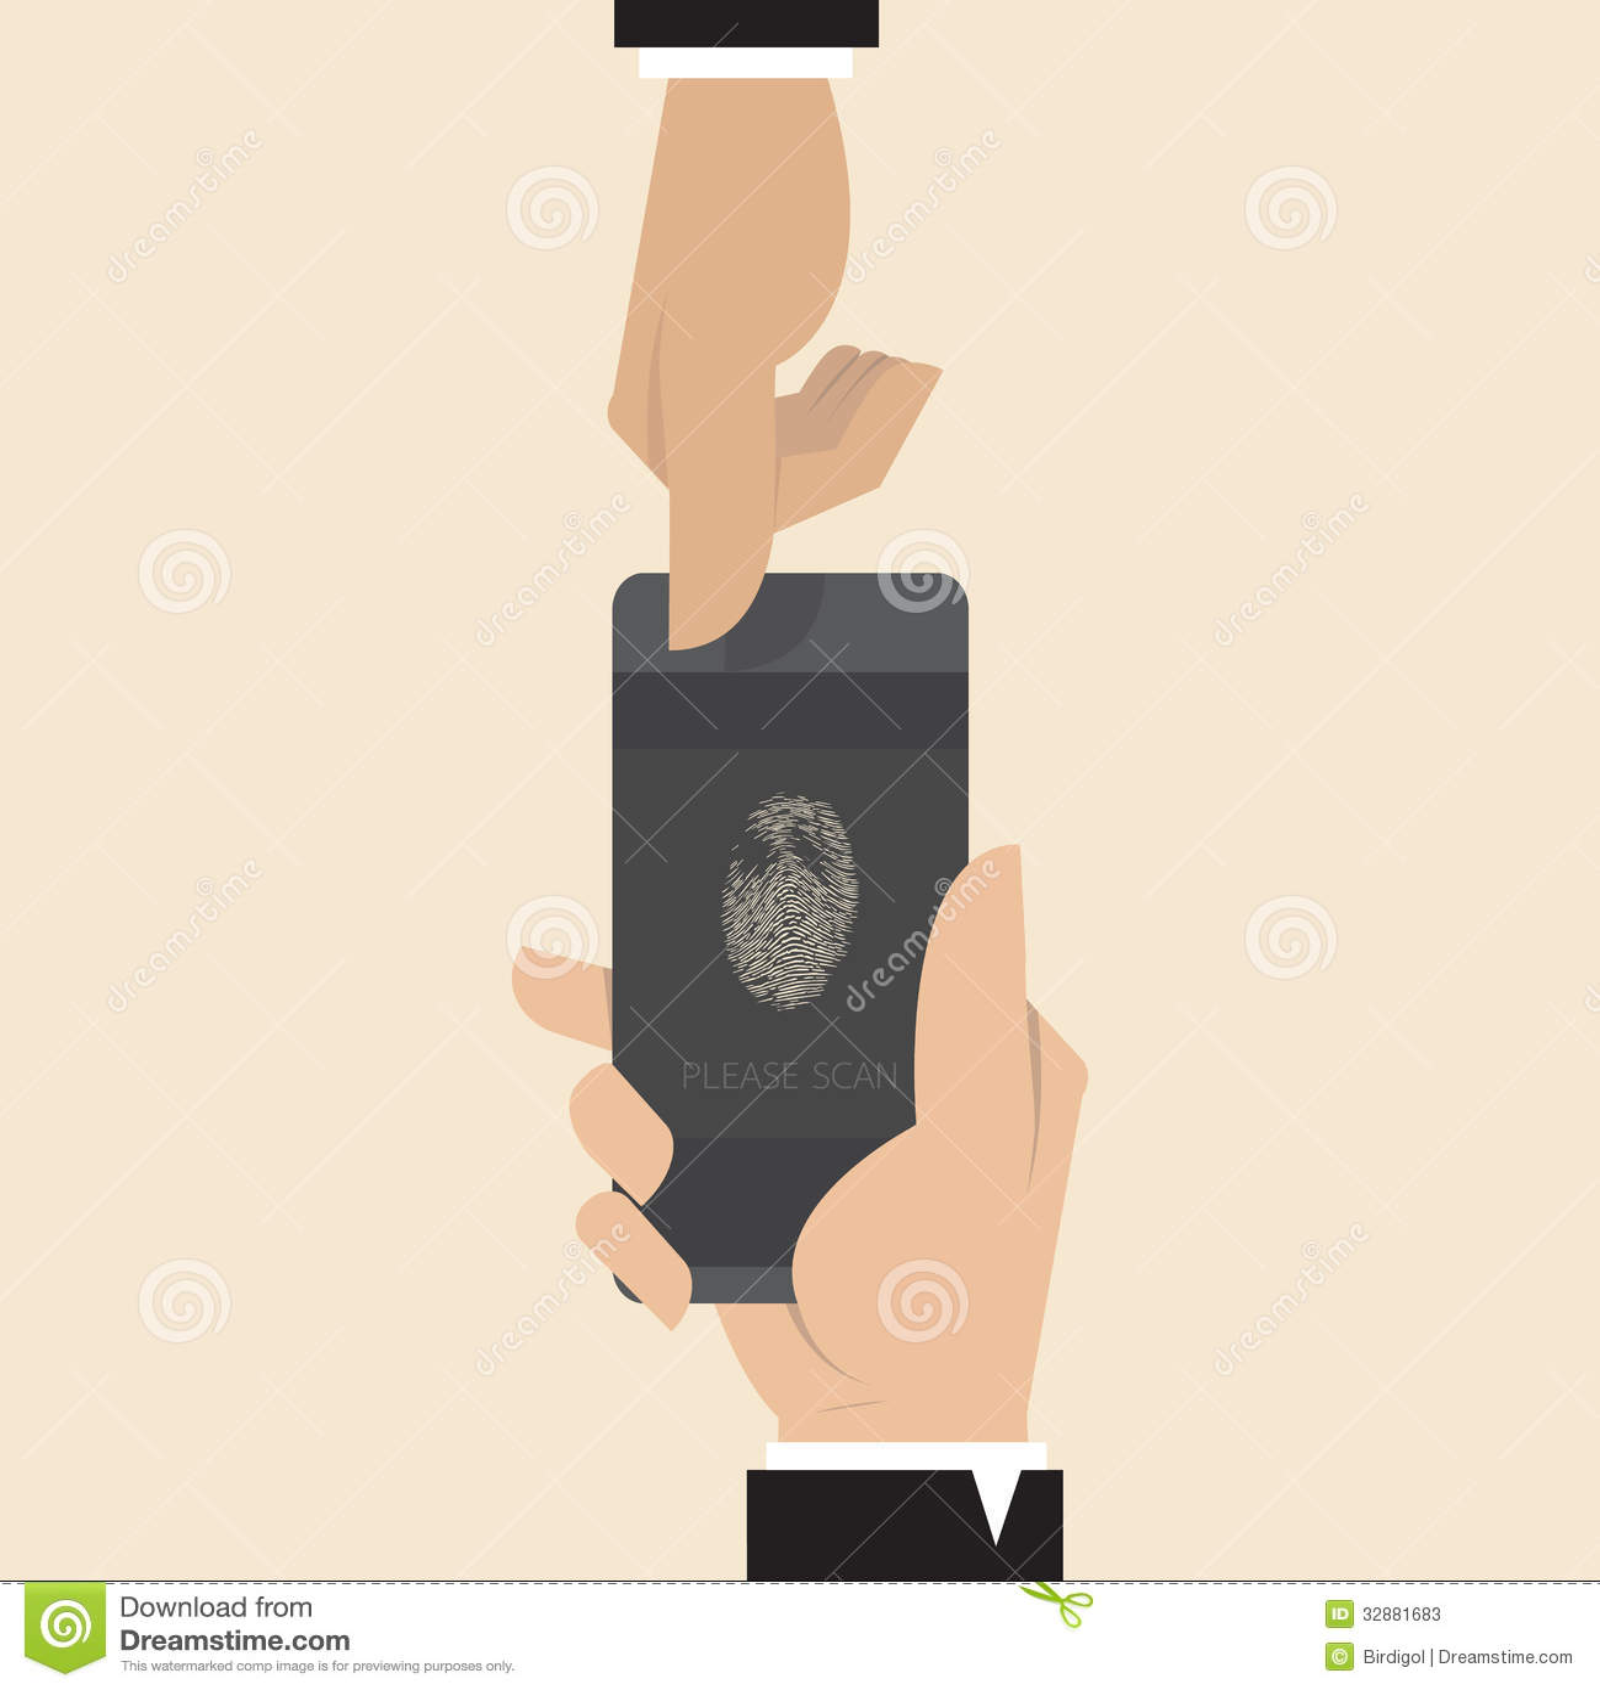 Smart Phone With Finger Print Scanner App Stock Vector